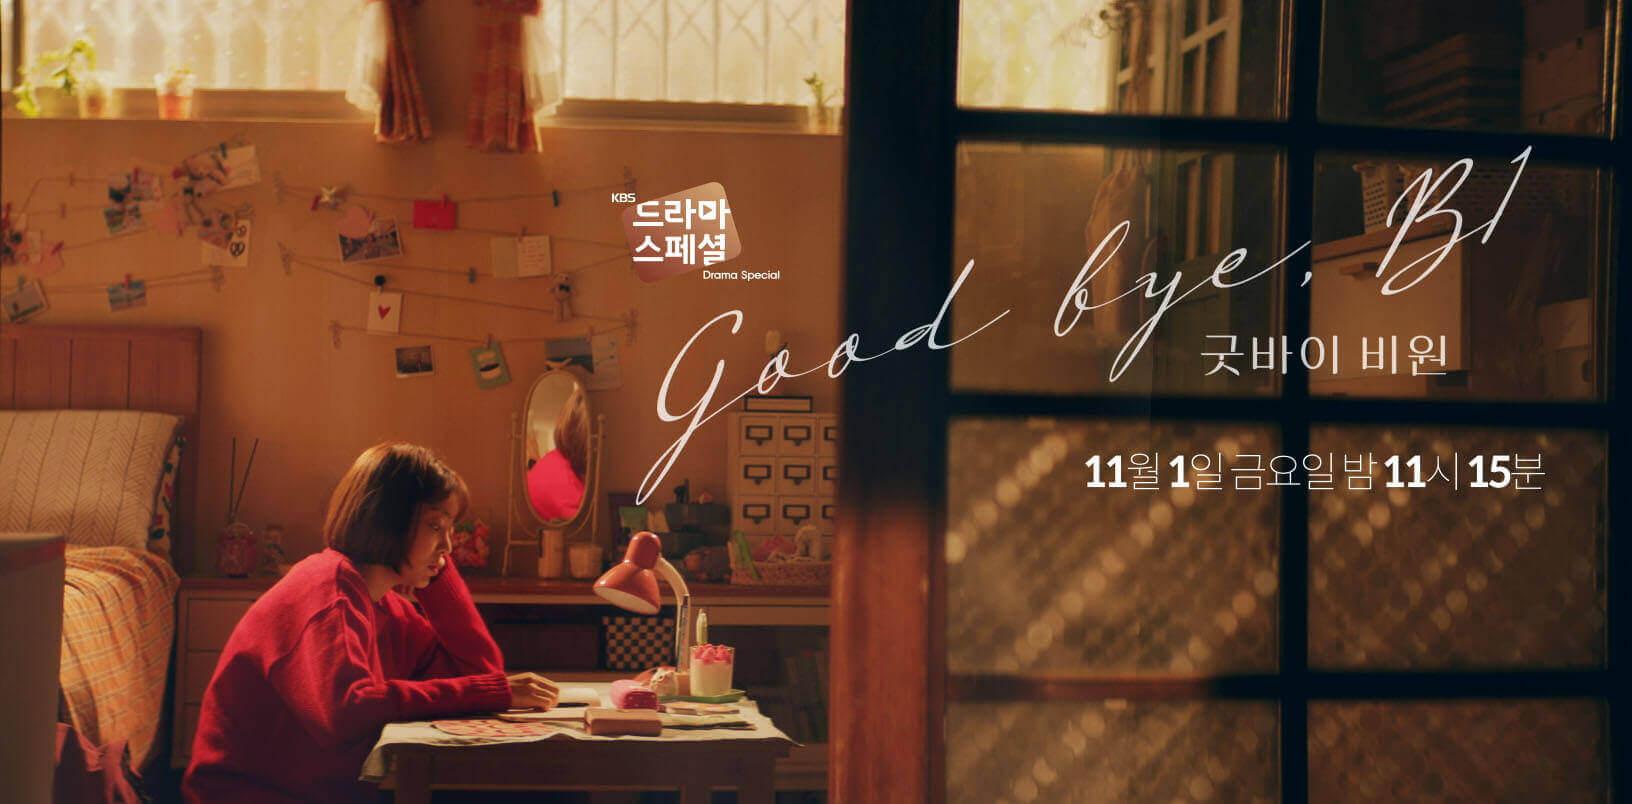 Goodbye B1 - KBS Drama Special 2019